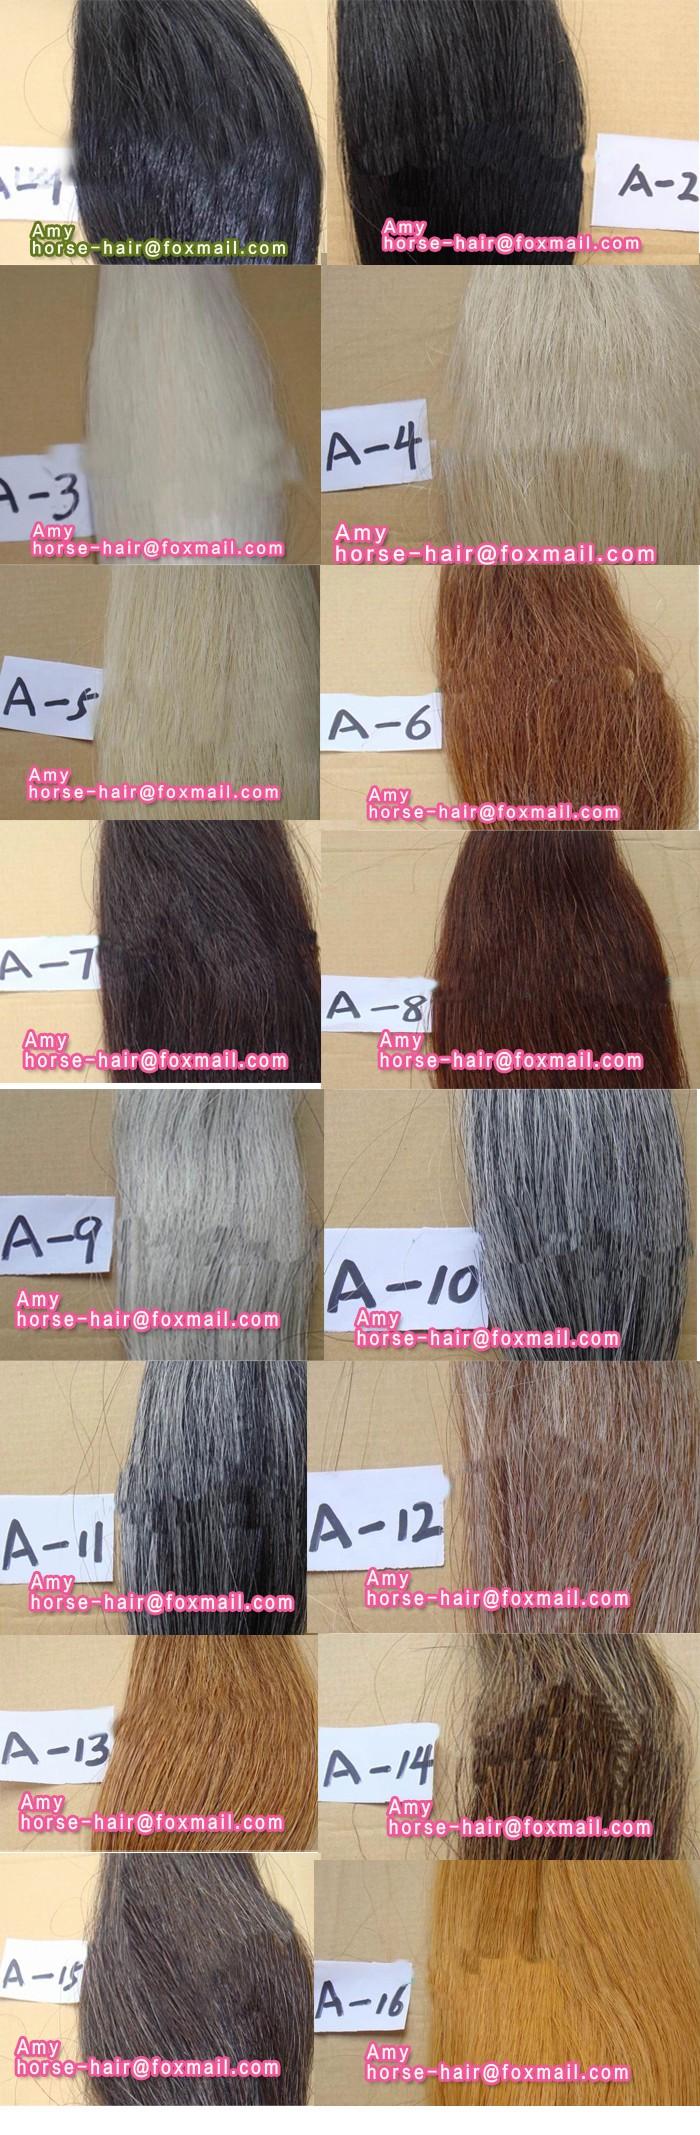 Loose Horse Hair For Sell Mongolian Horse Hair Horse Hair For Brush